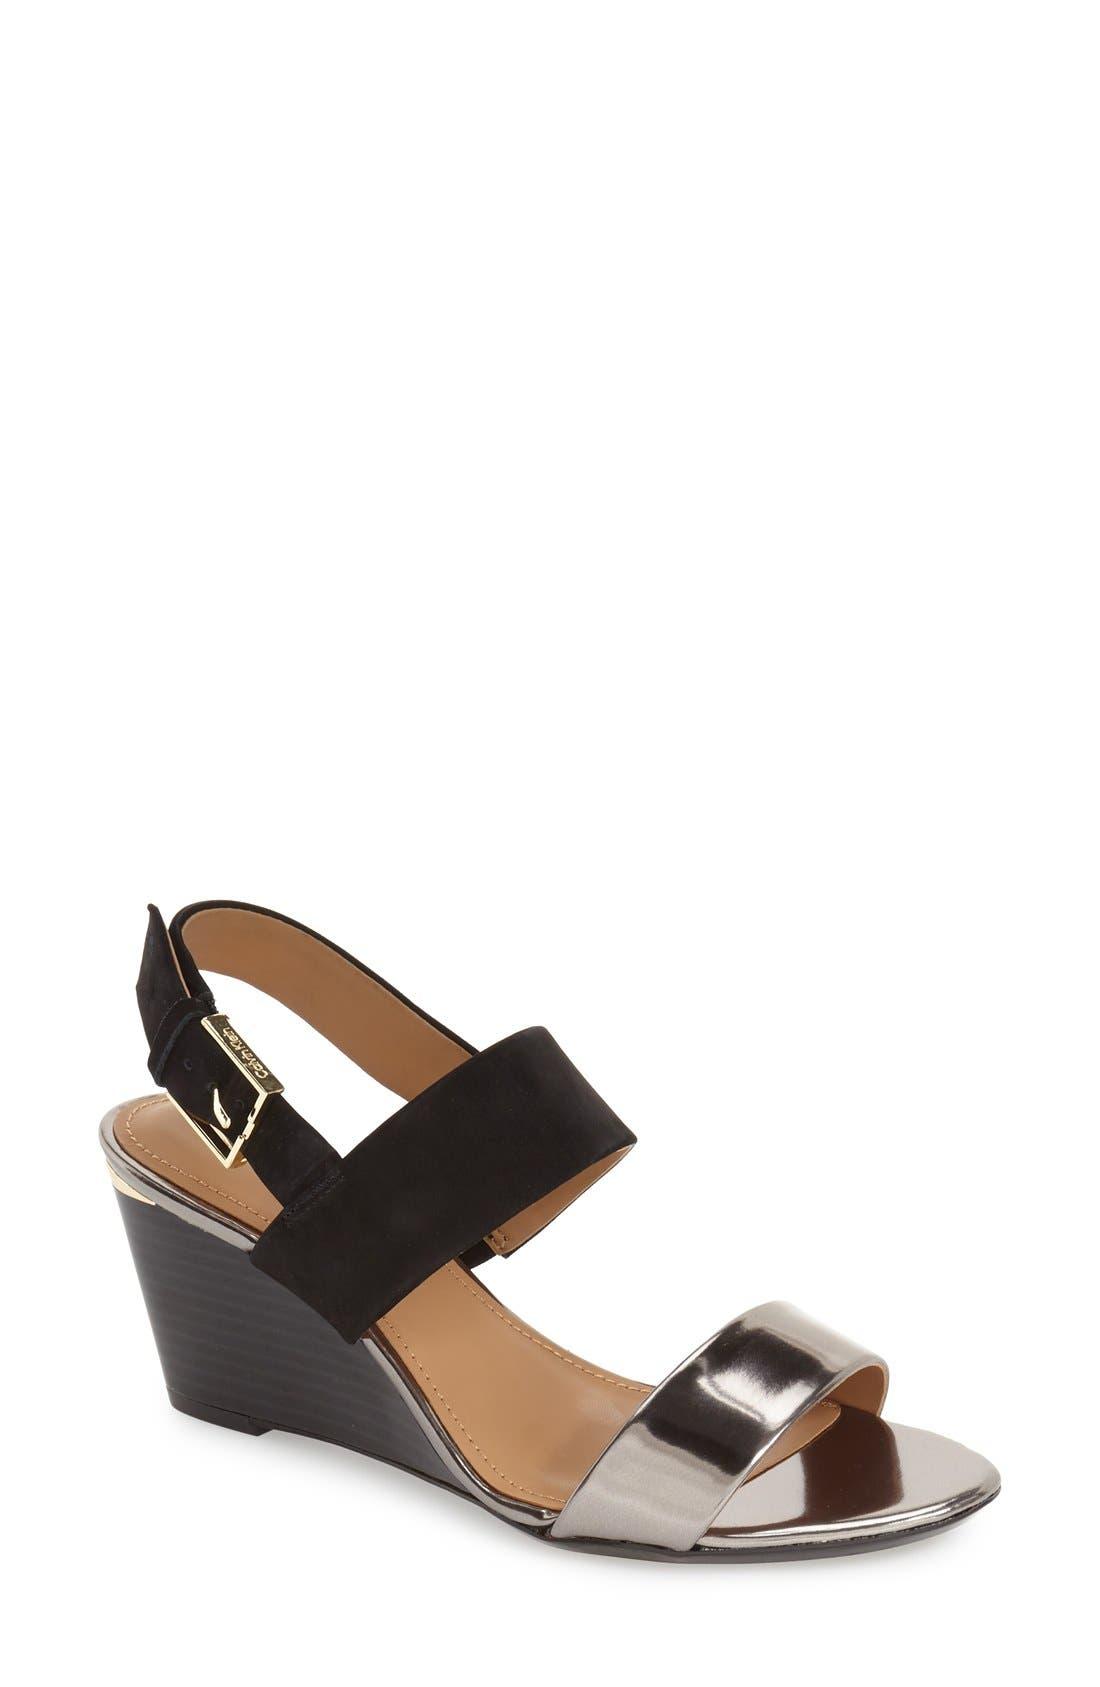 'Pearla' Wedge Sandal,                         Main,                         color, 001